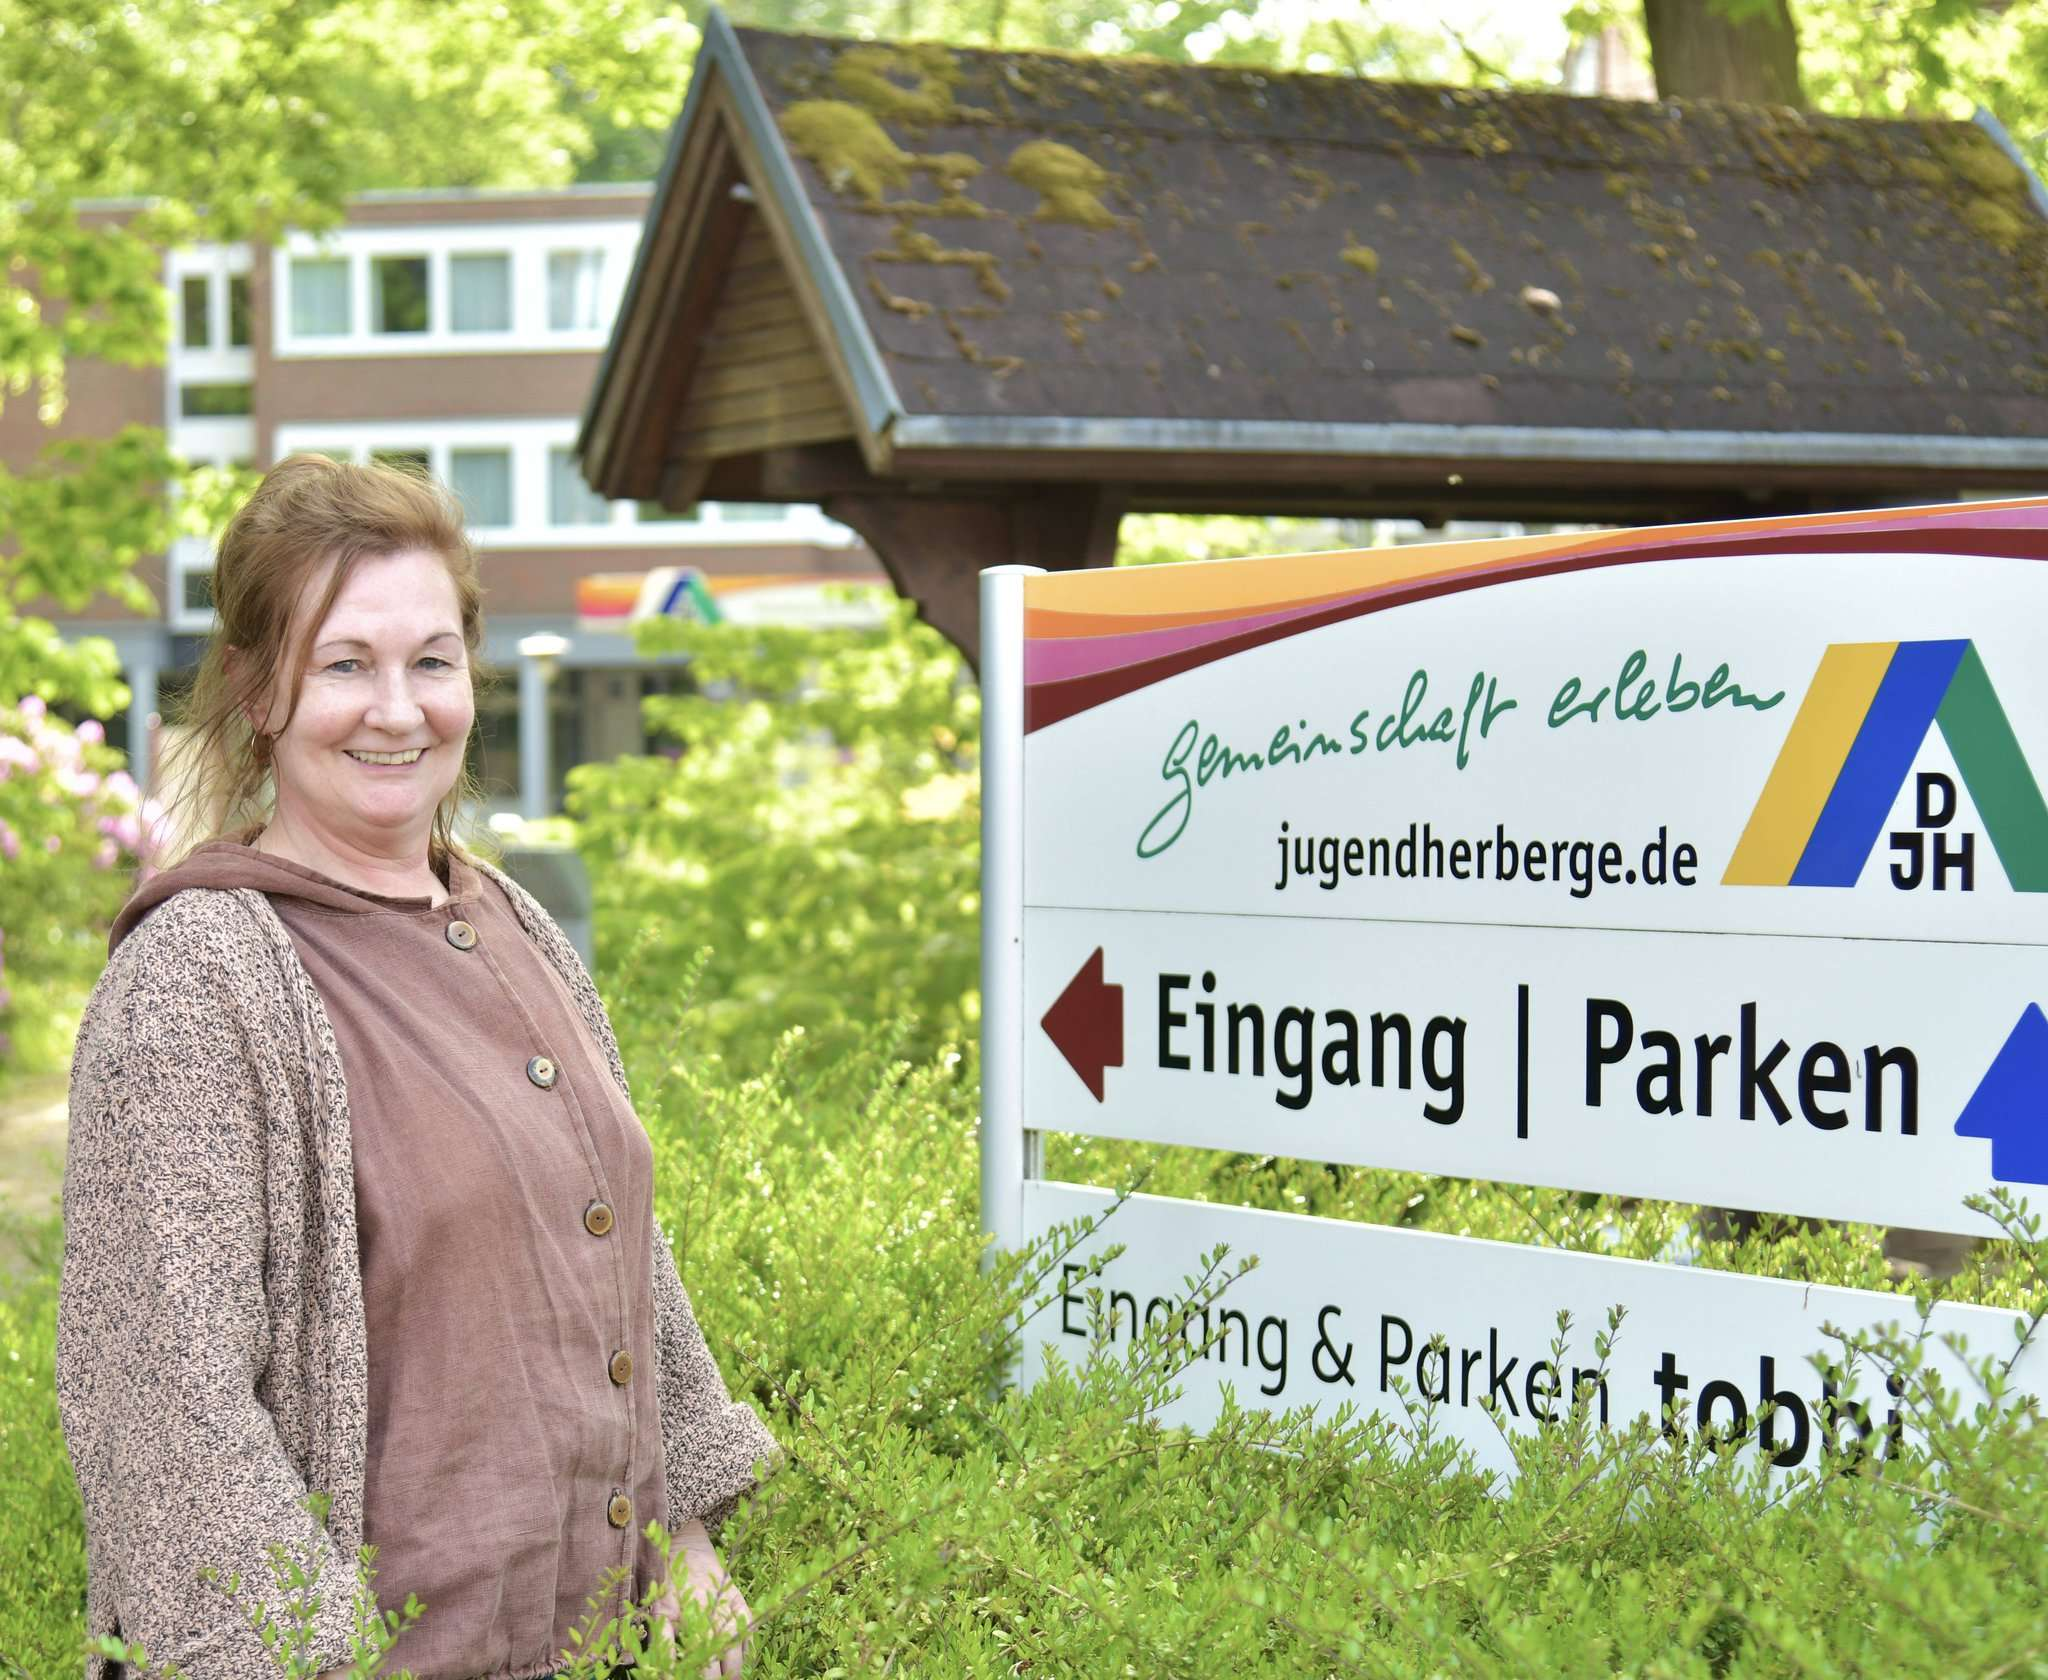 Rita Toll leitet die Jugendherberge in Rotenburg.